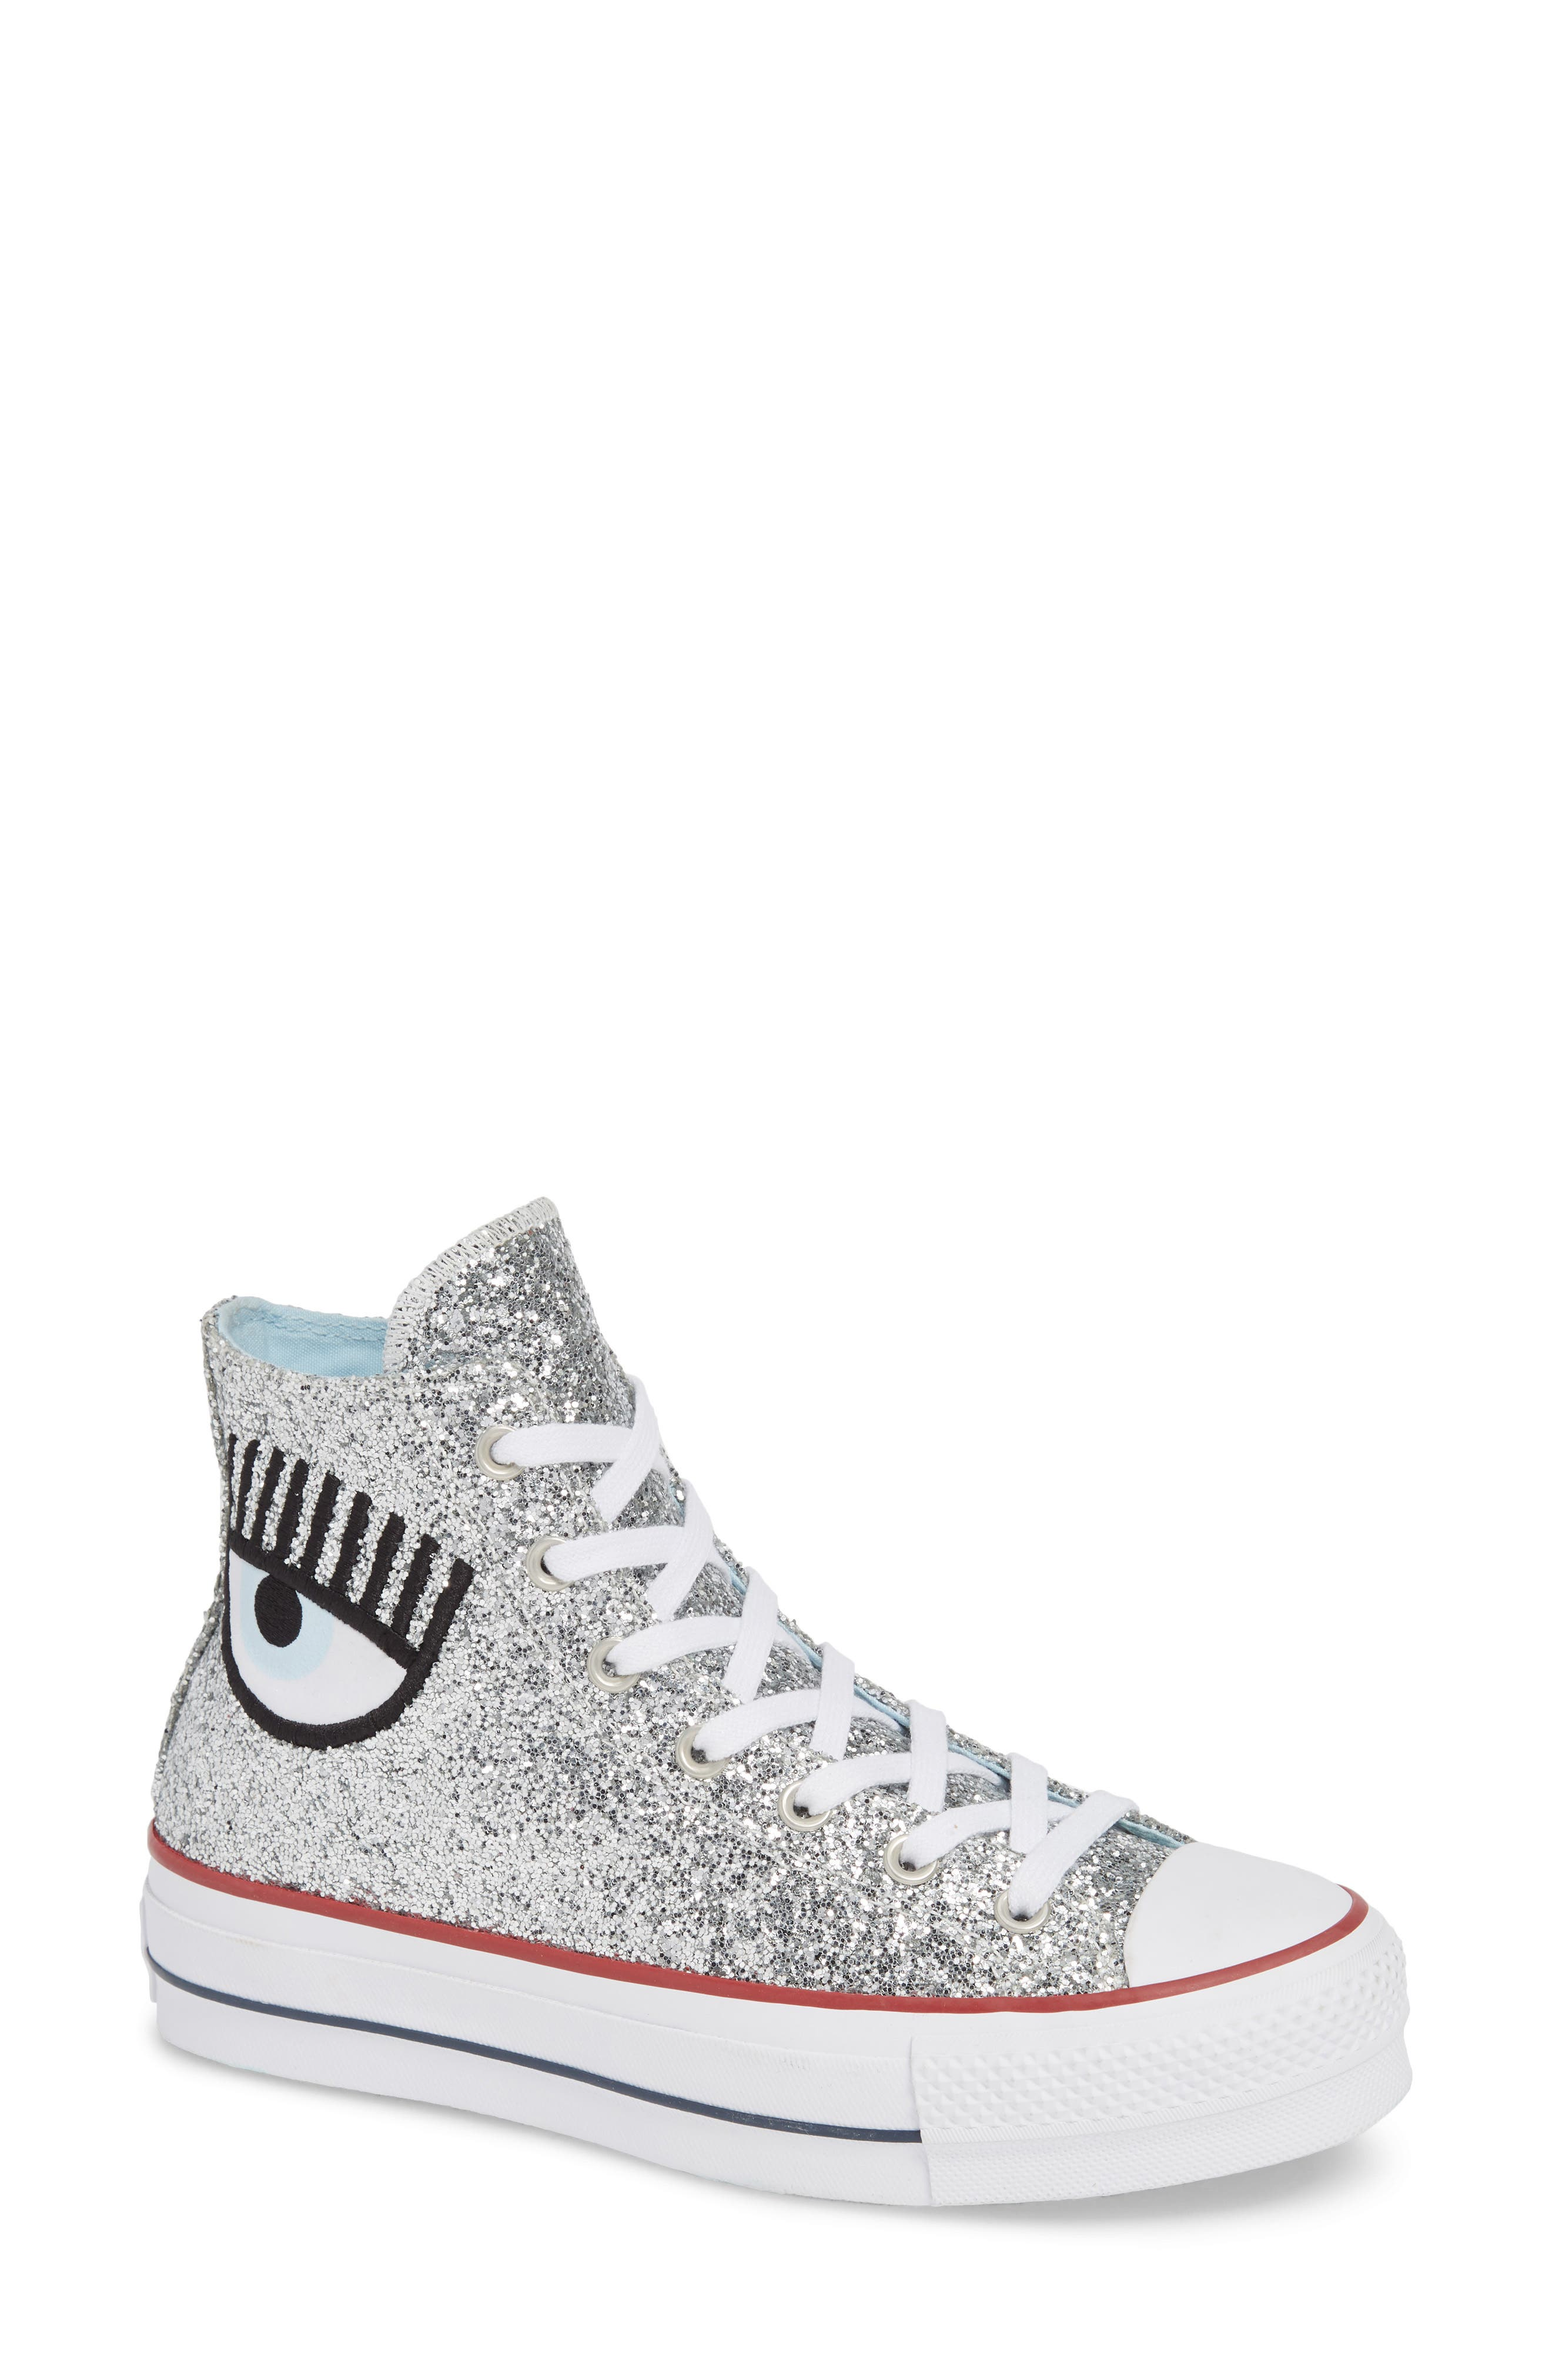 CONVERSE,                             x Chiara Ferragni 70 Hi One Star Glitter Platform Sneaker,                             Main thumbnail 1, color,                             040